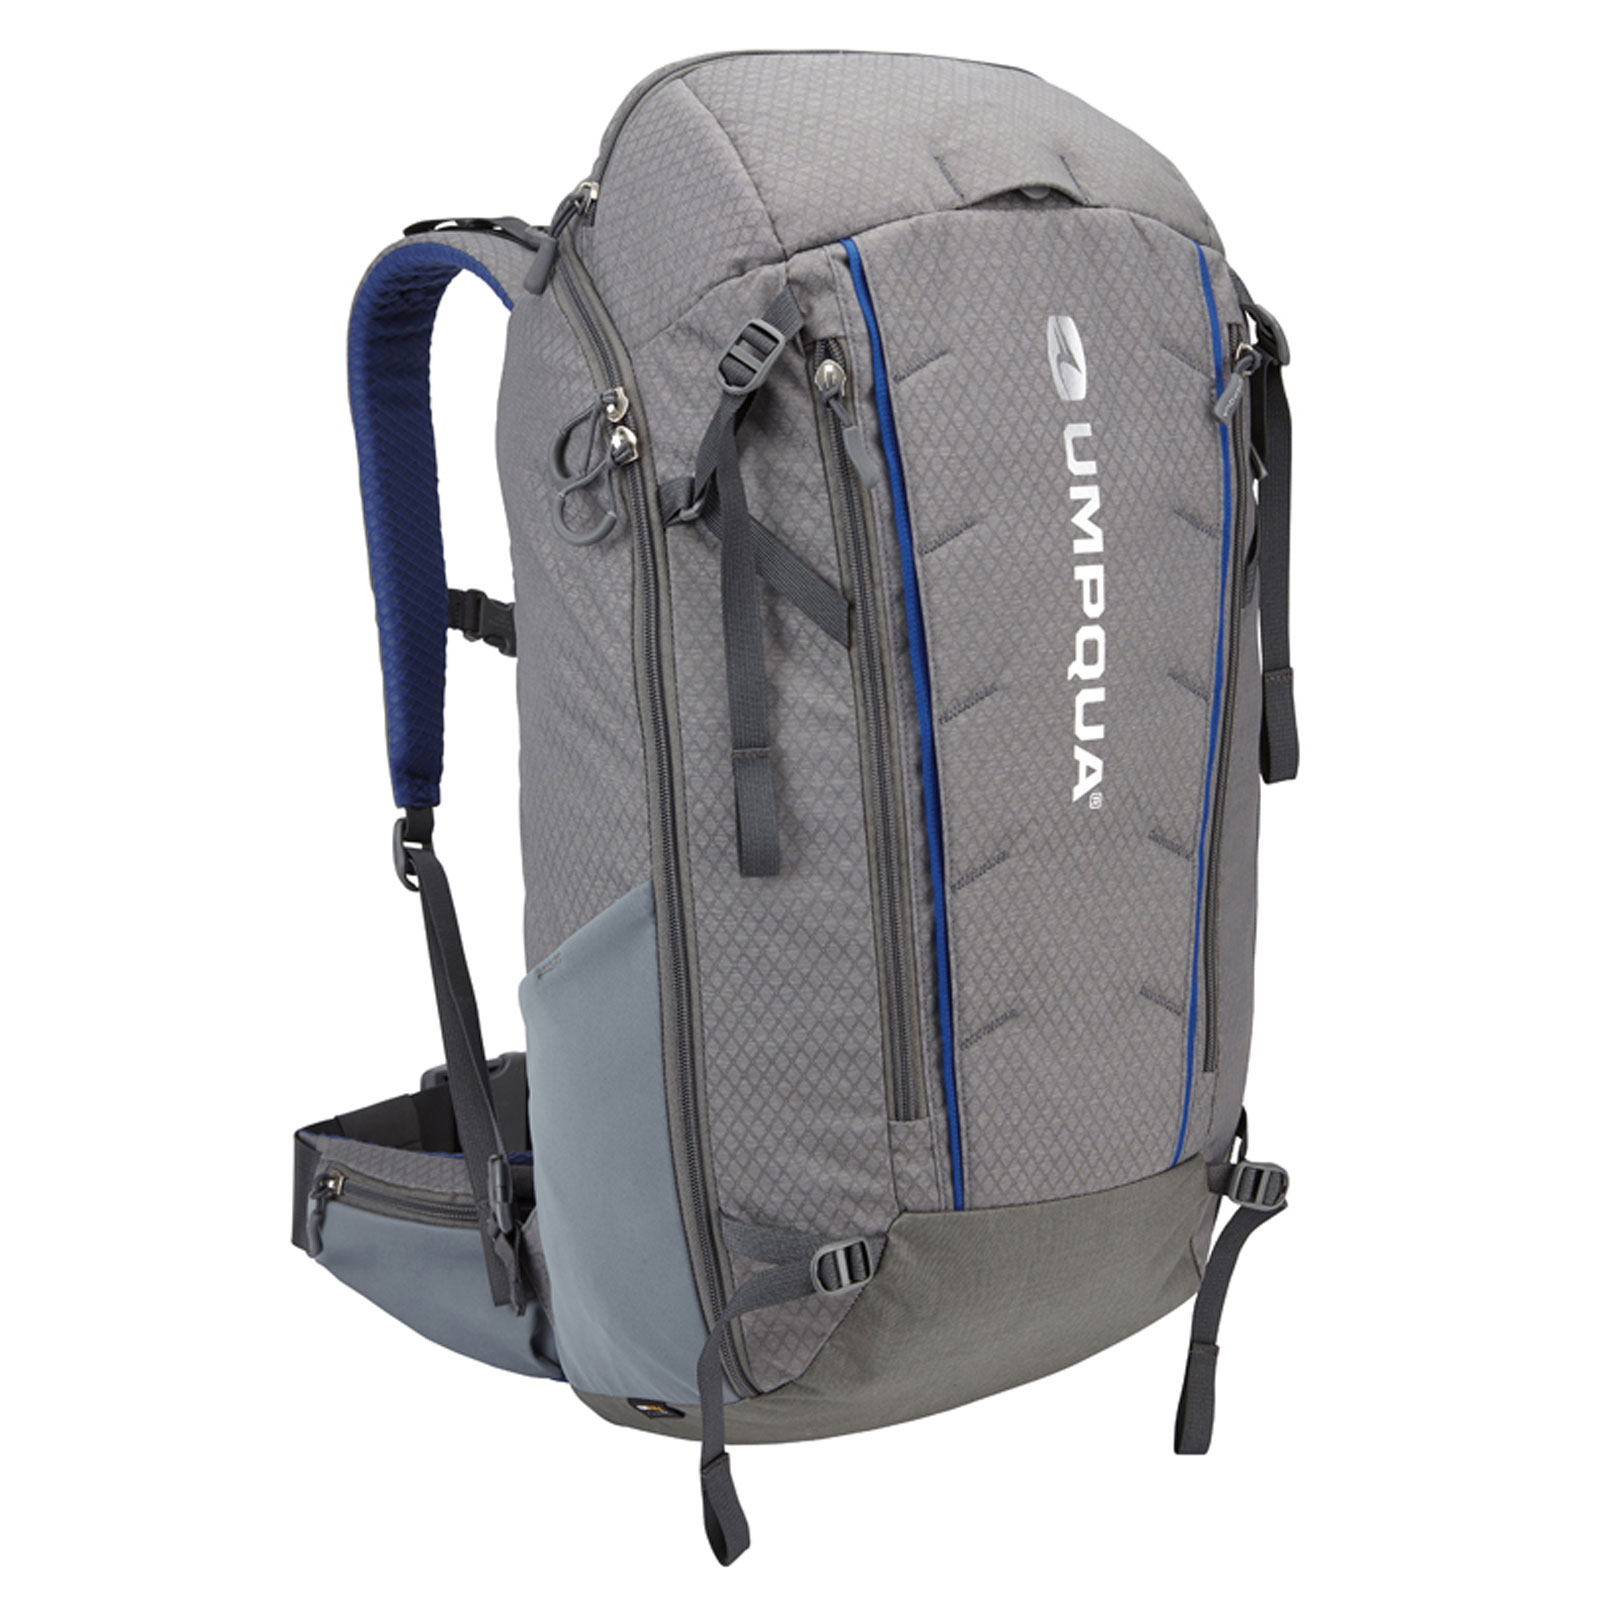 Umpqua surveyor 2000 zs zero sweep backpack fly fishing for Fly fishing bag